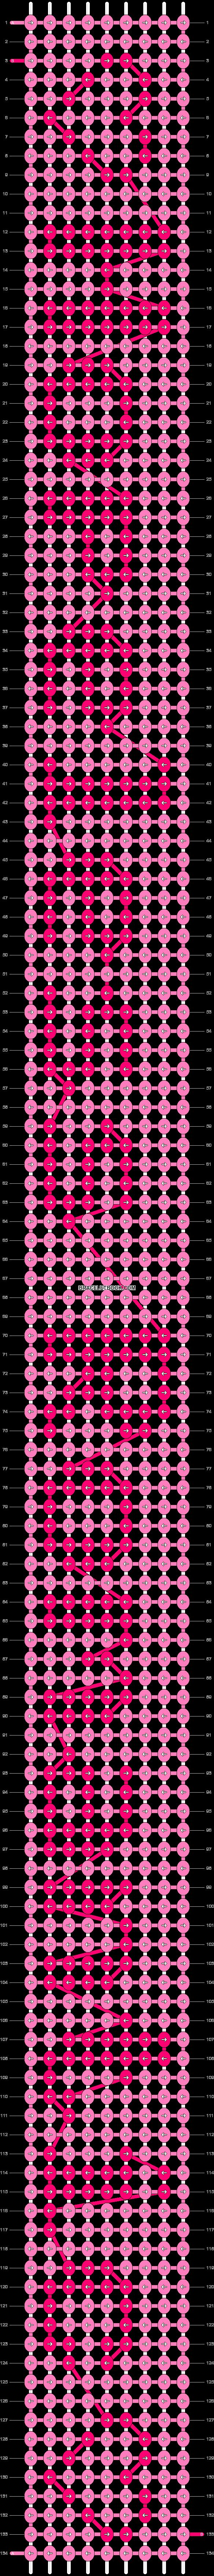 Alpha pattern #6131 pattern